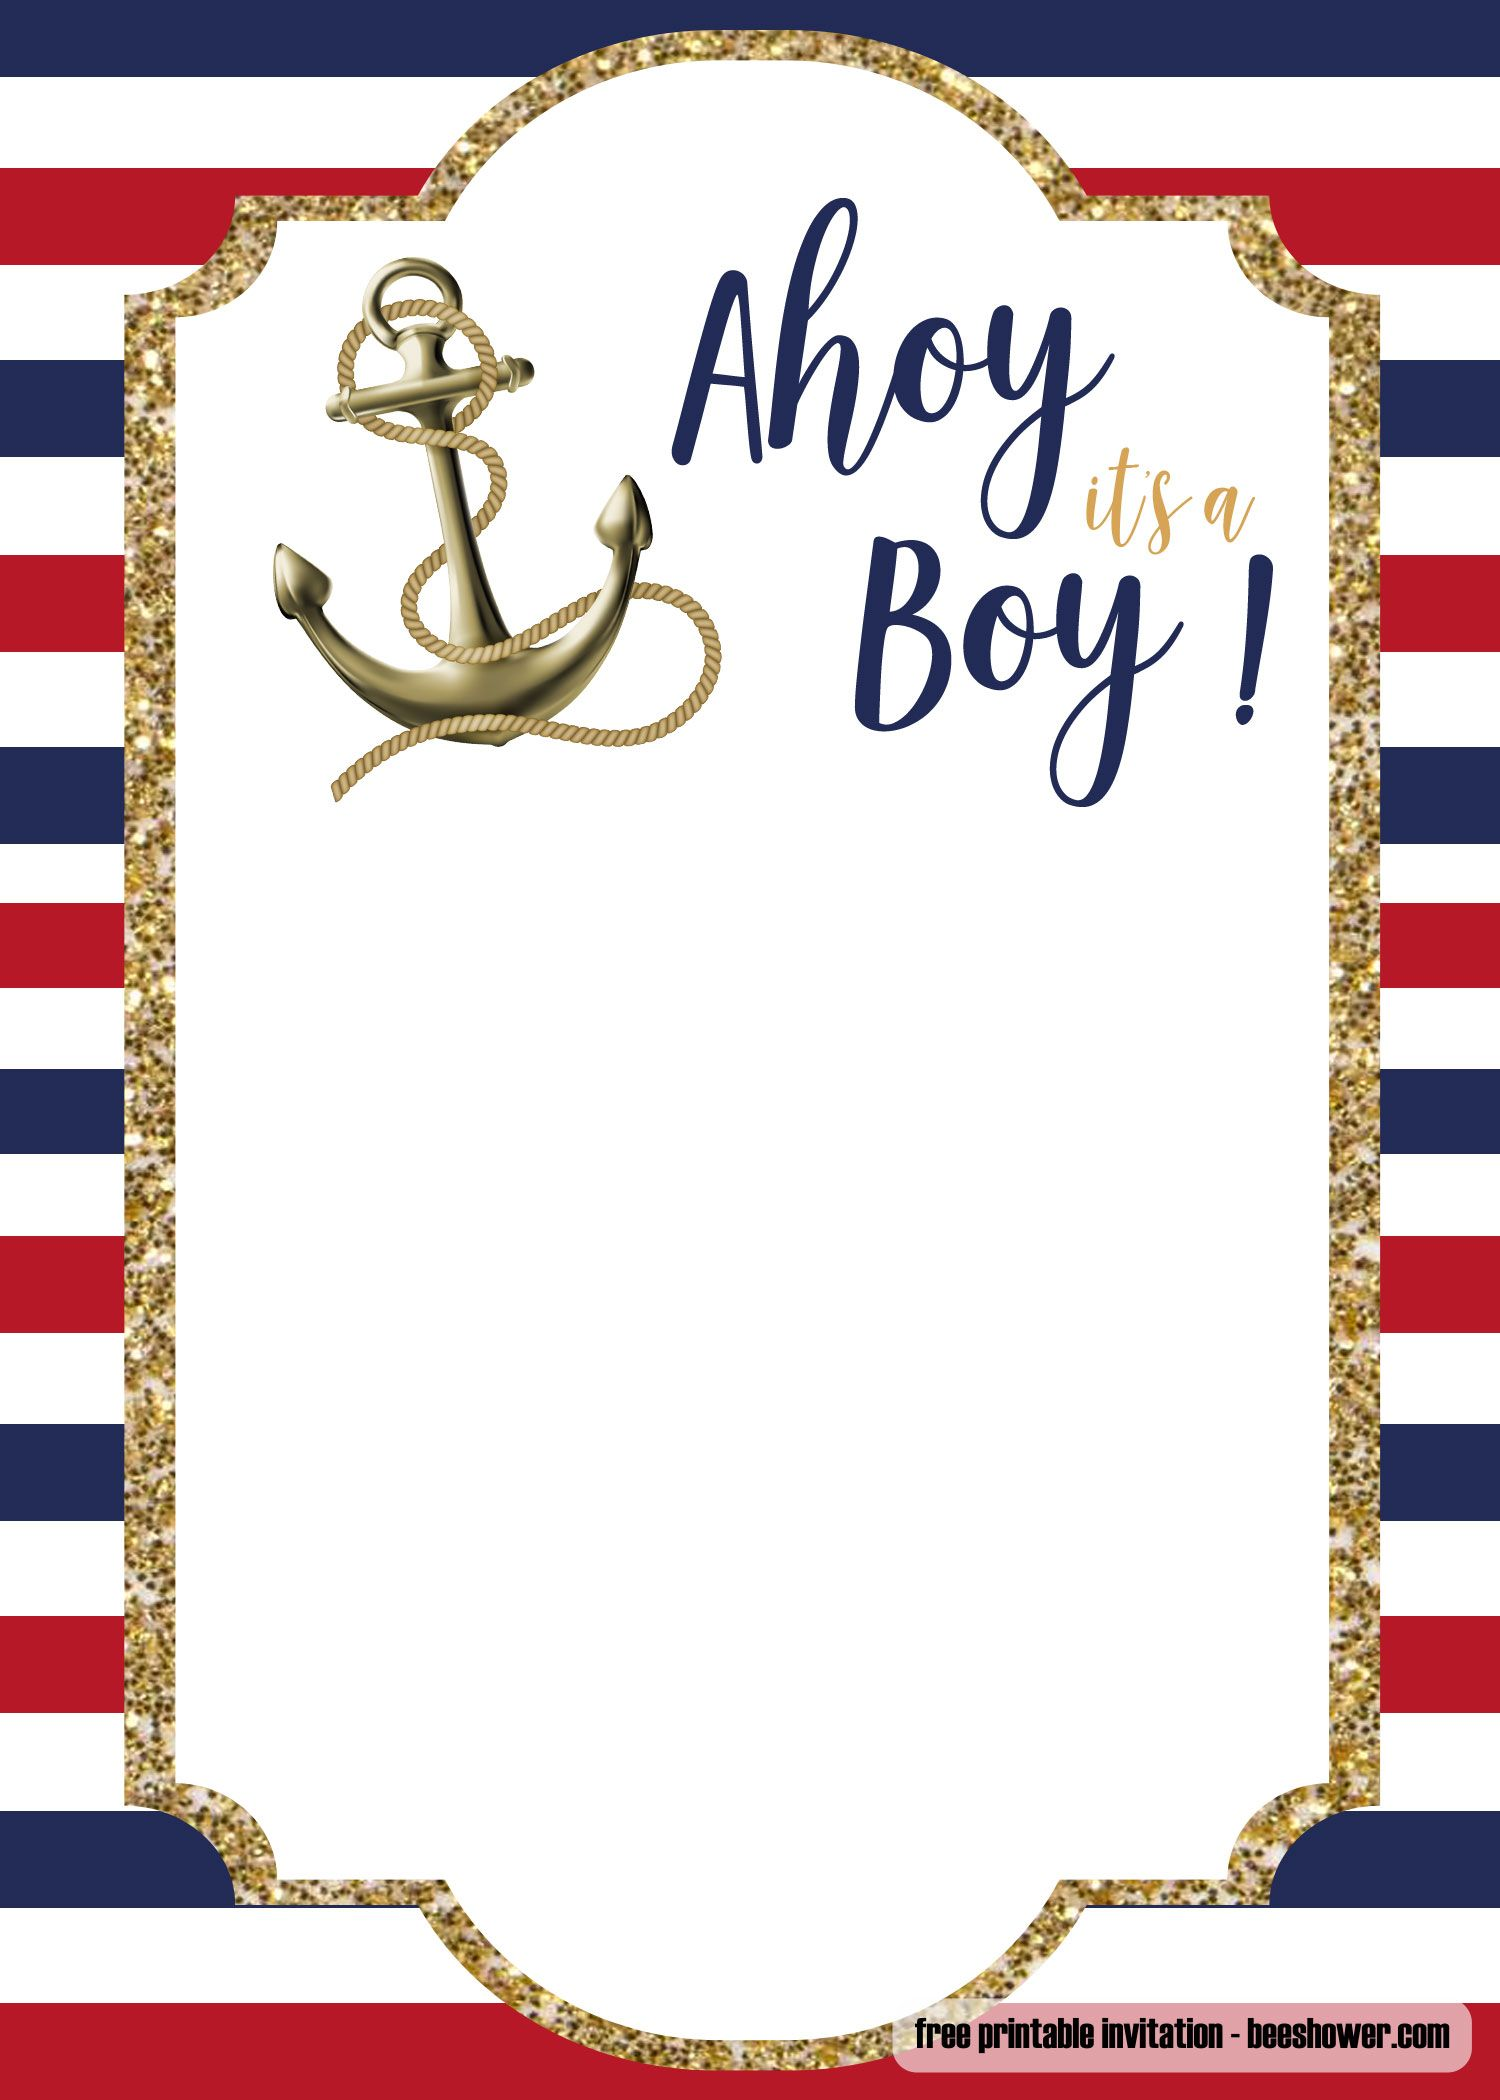 FREE Nautical Baby Shower Invitations Templates  Nautical baby